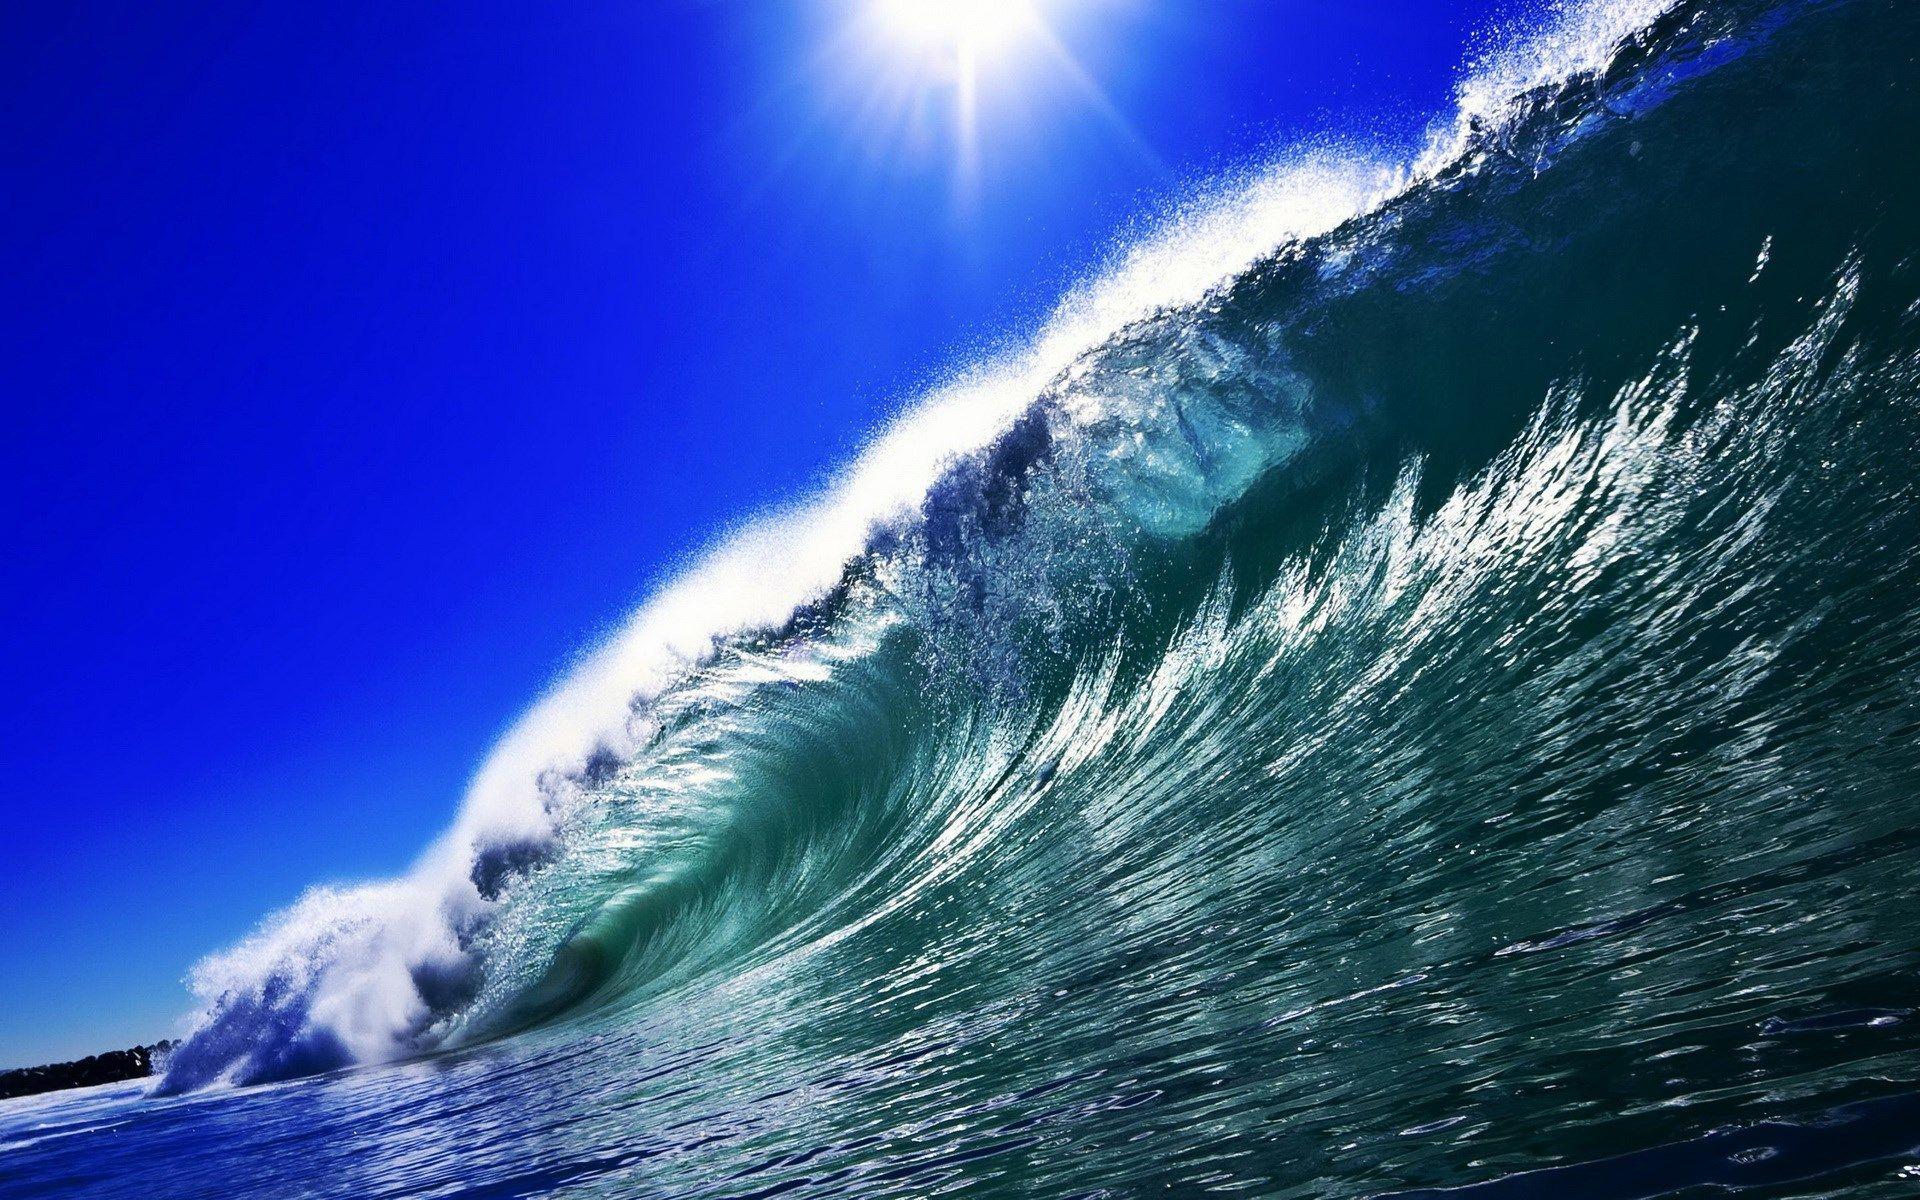 Wonderful Wallpaper Macbook Wave - f49264b22b77e5d81429f108acf67864  Picture_855126.jpg